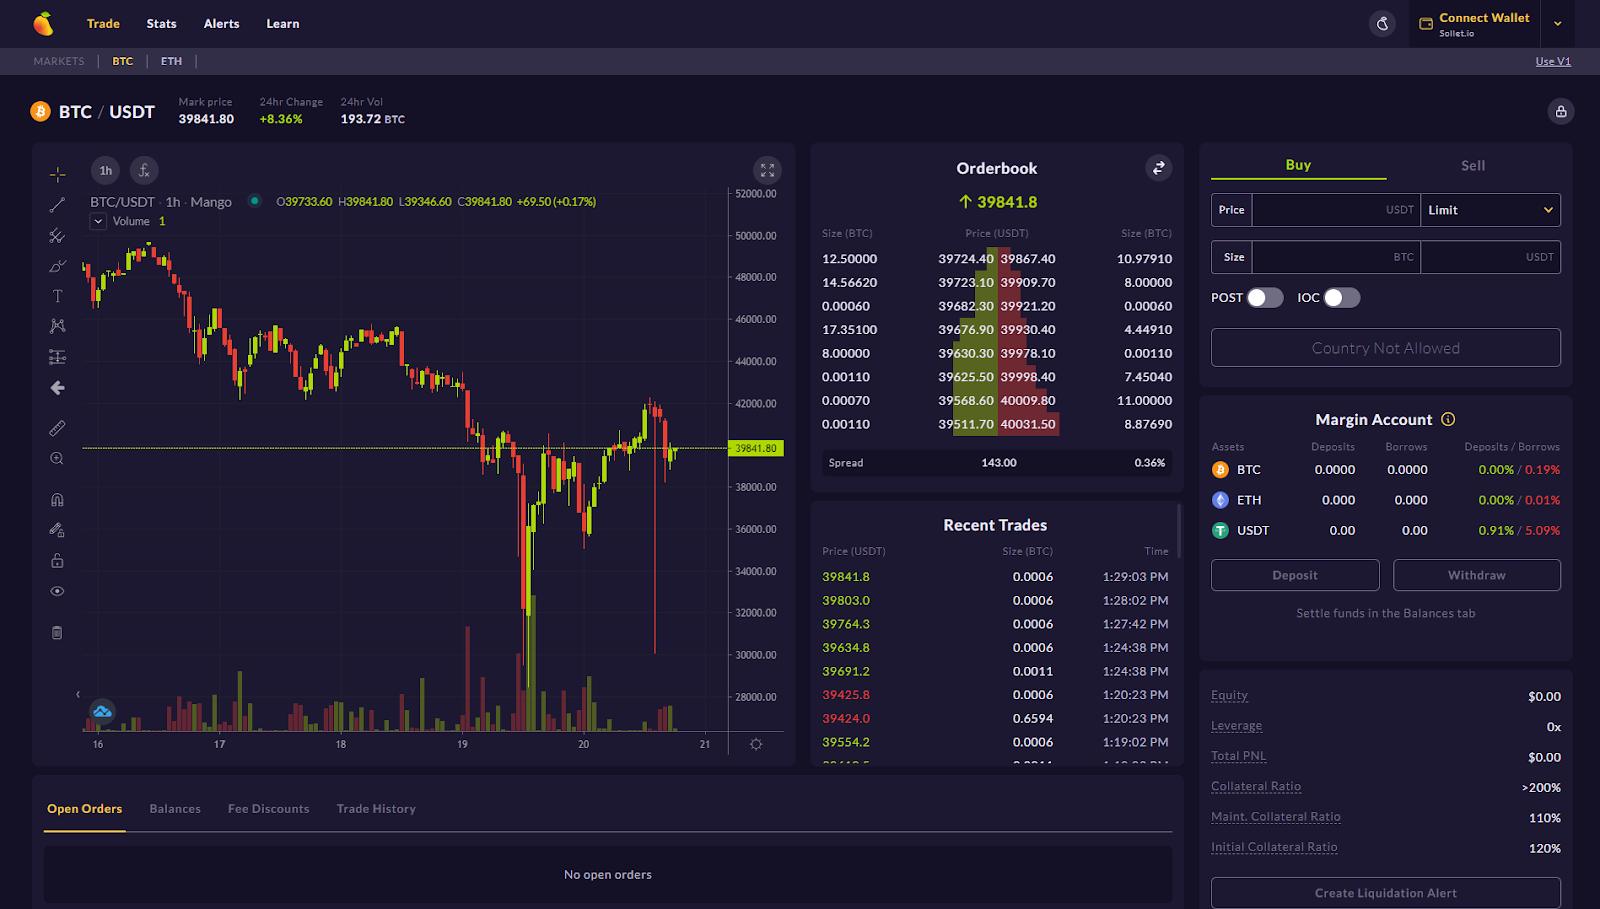 mango markets trading interface